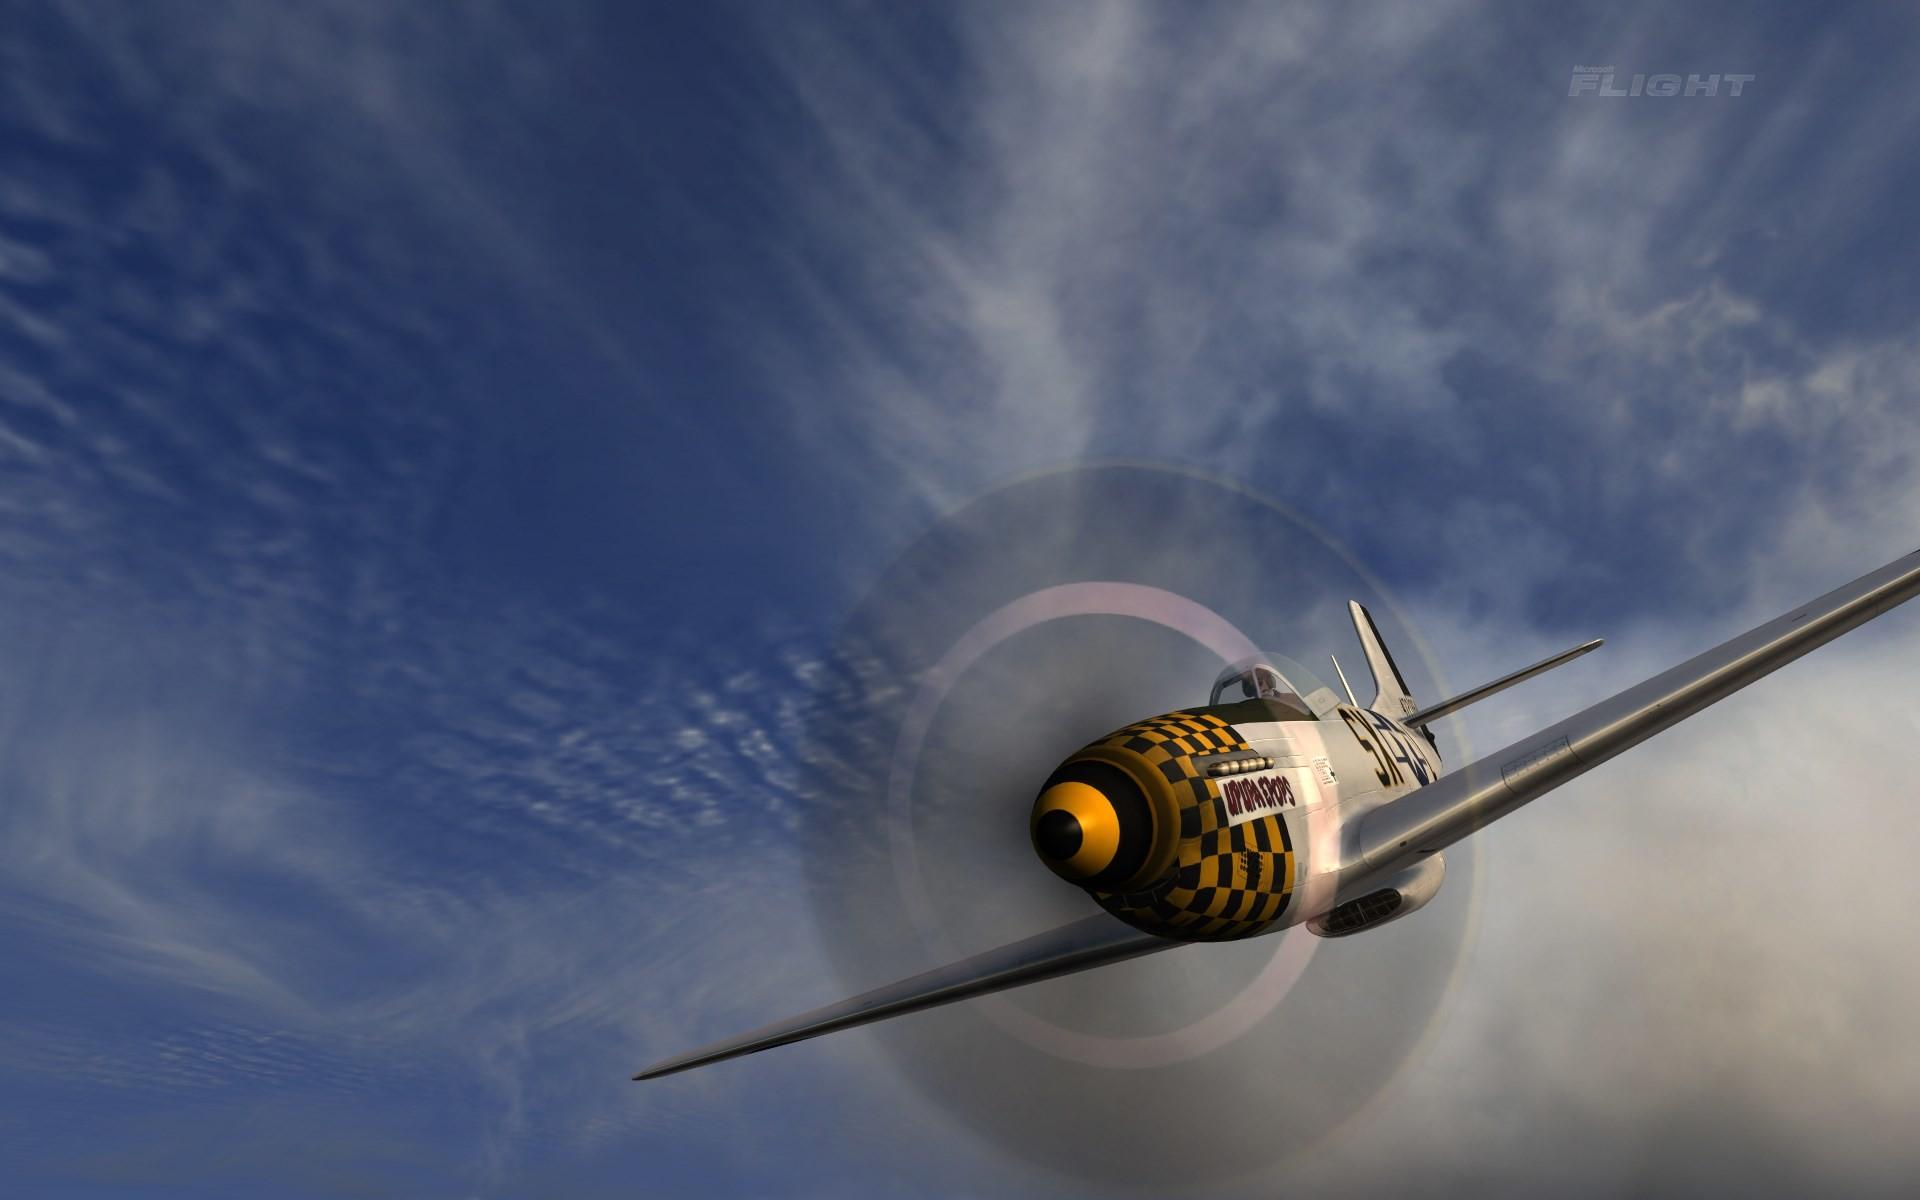 Picture for Desktop: microsoft flight hawaii